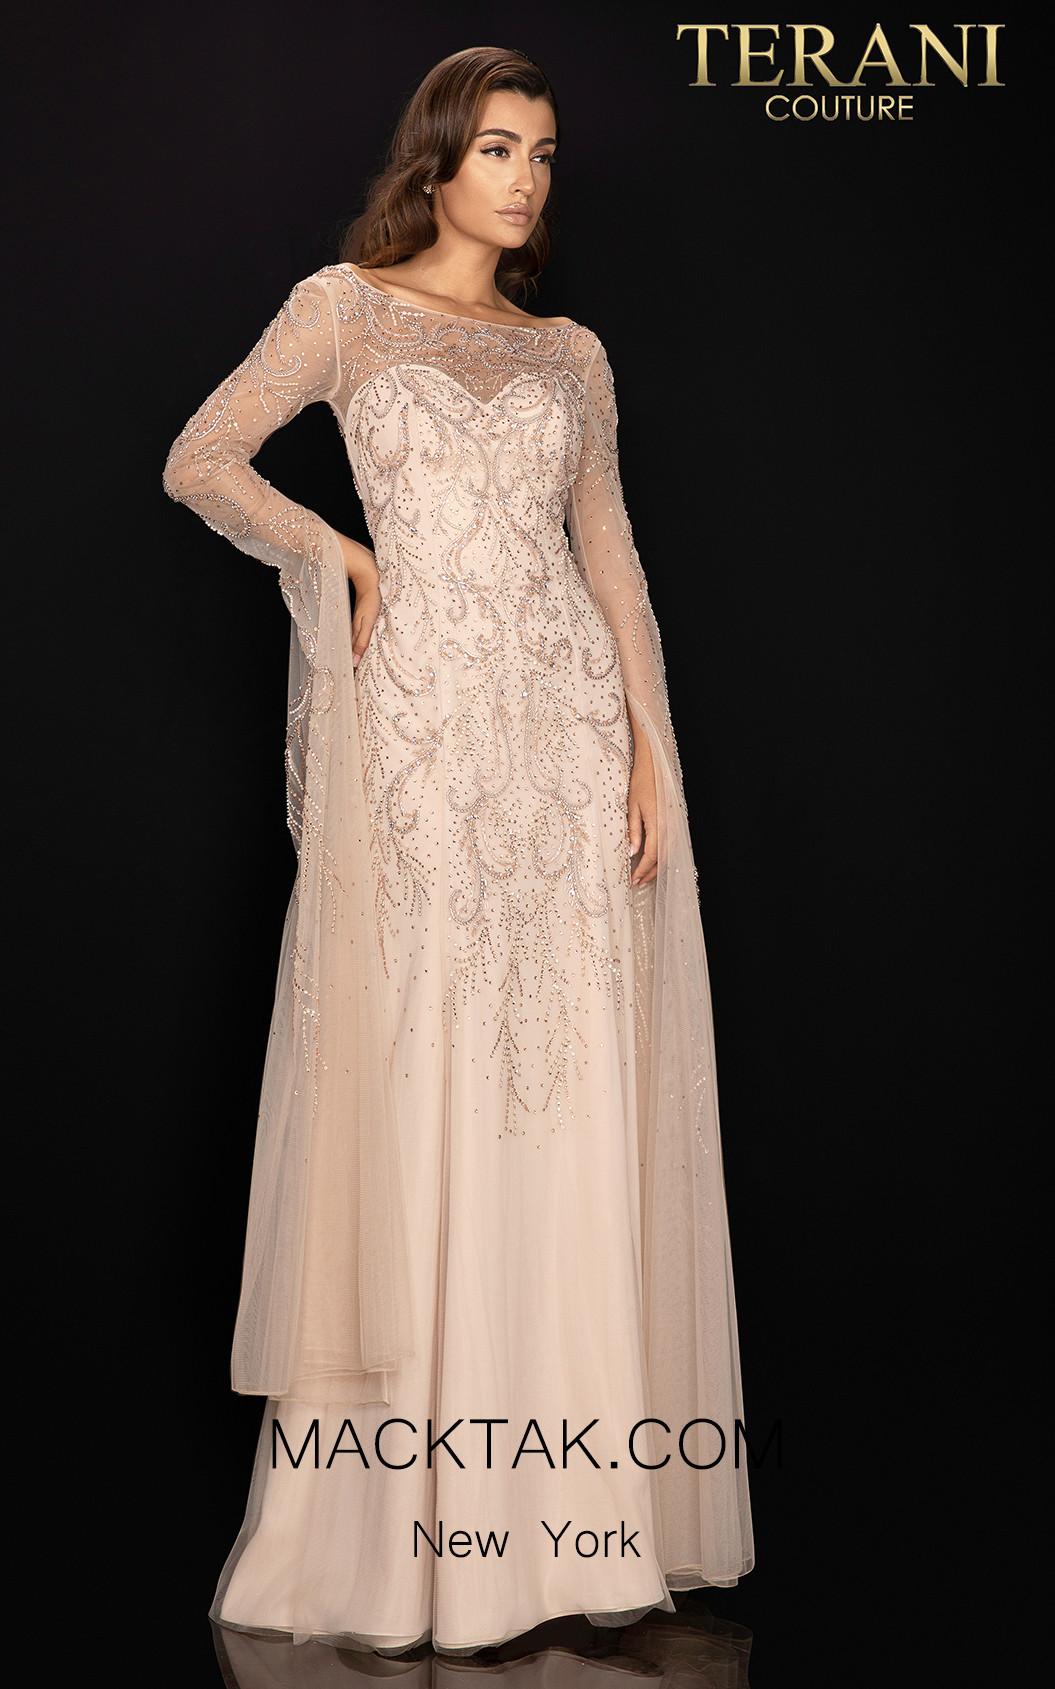 Terani 2011M2169 Light Taupe Front Dress